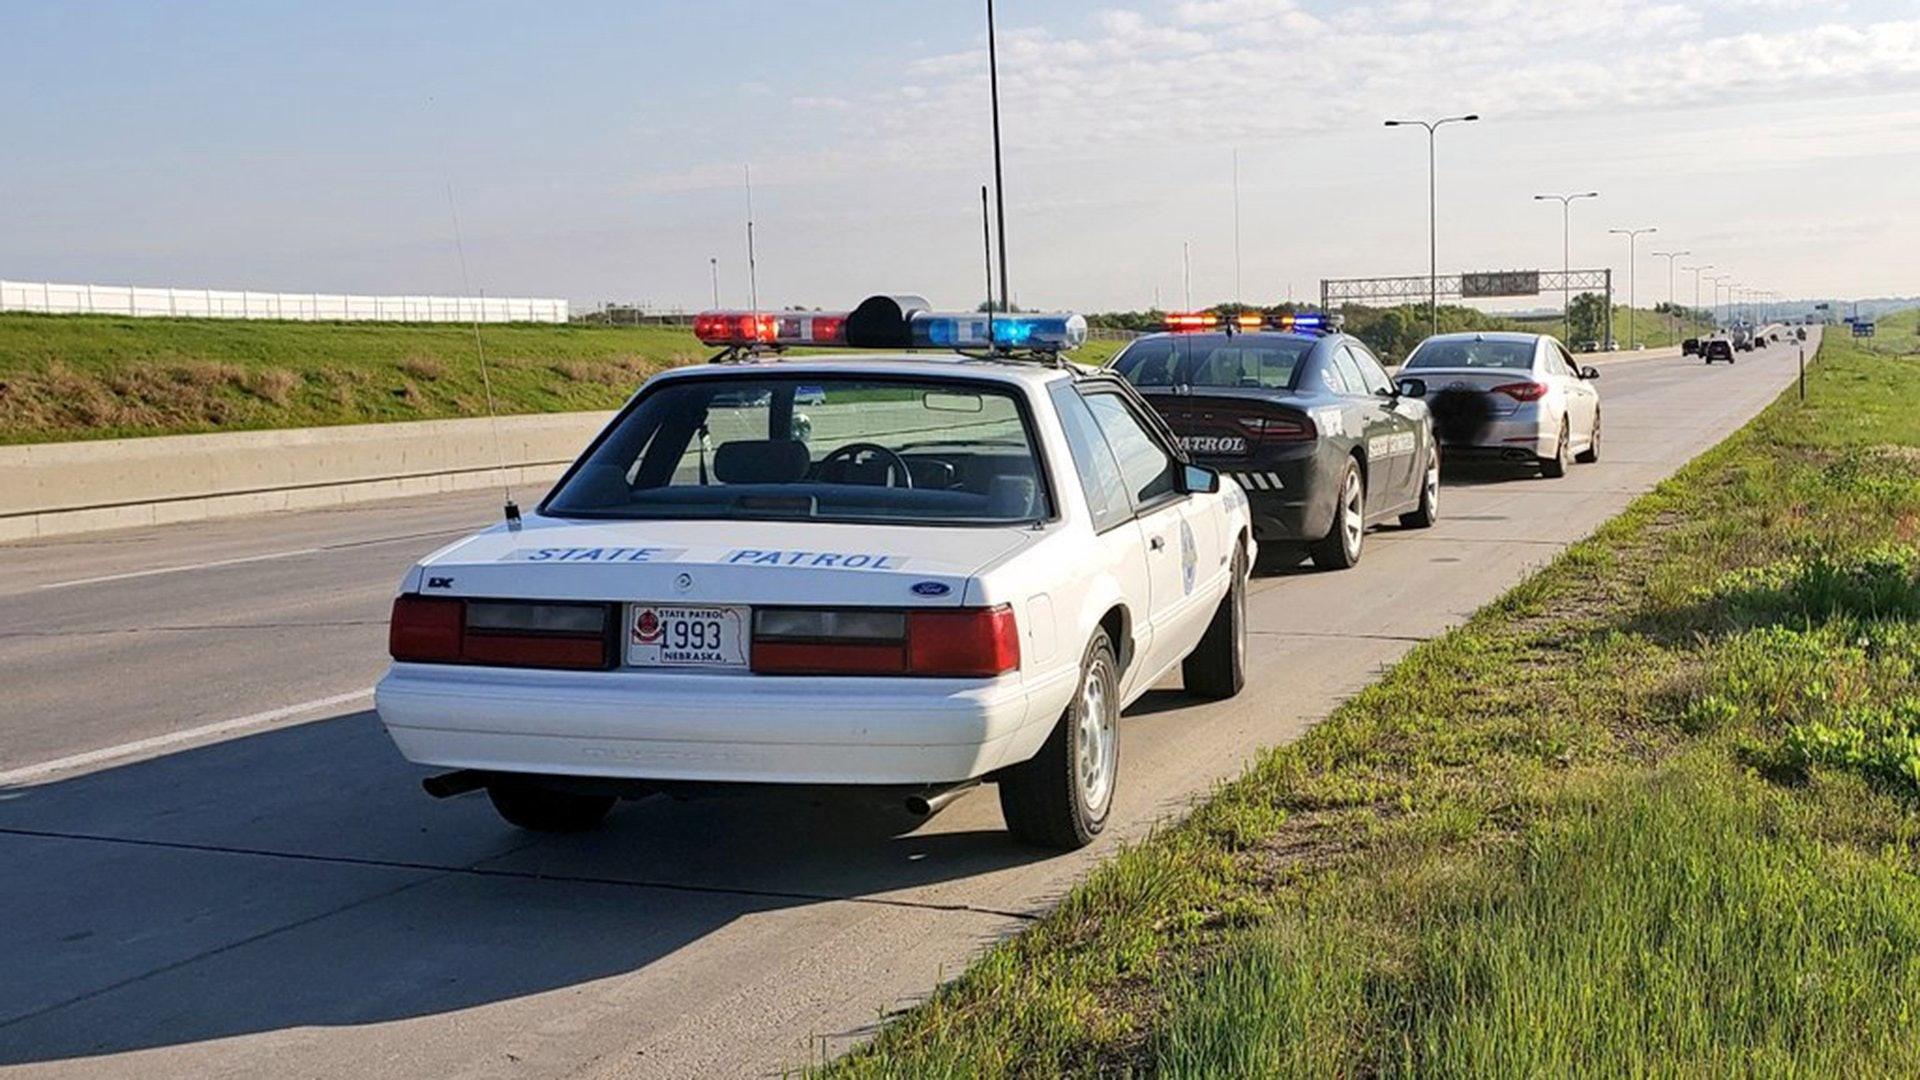 1993-ford-mustang-ssp-nebraska-state-patrol.jpg